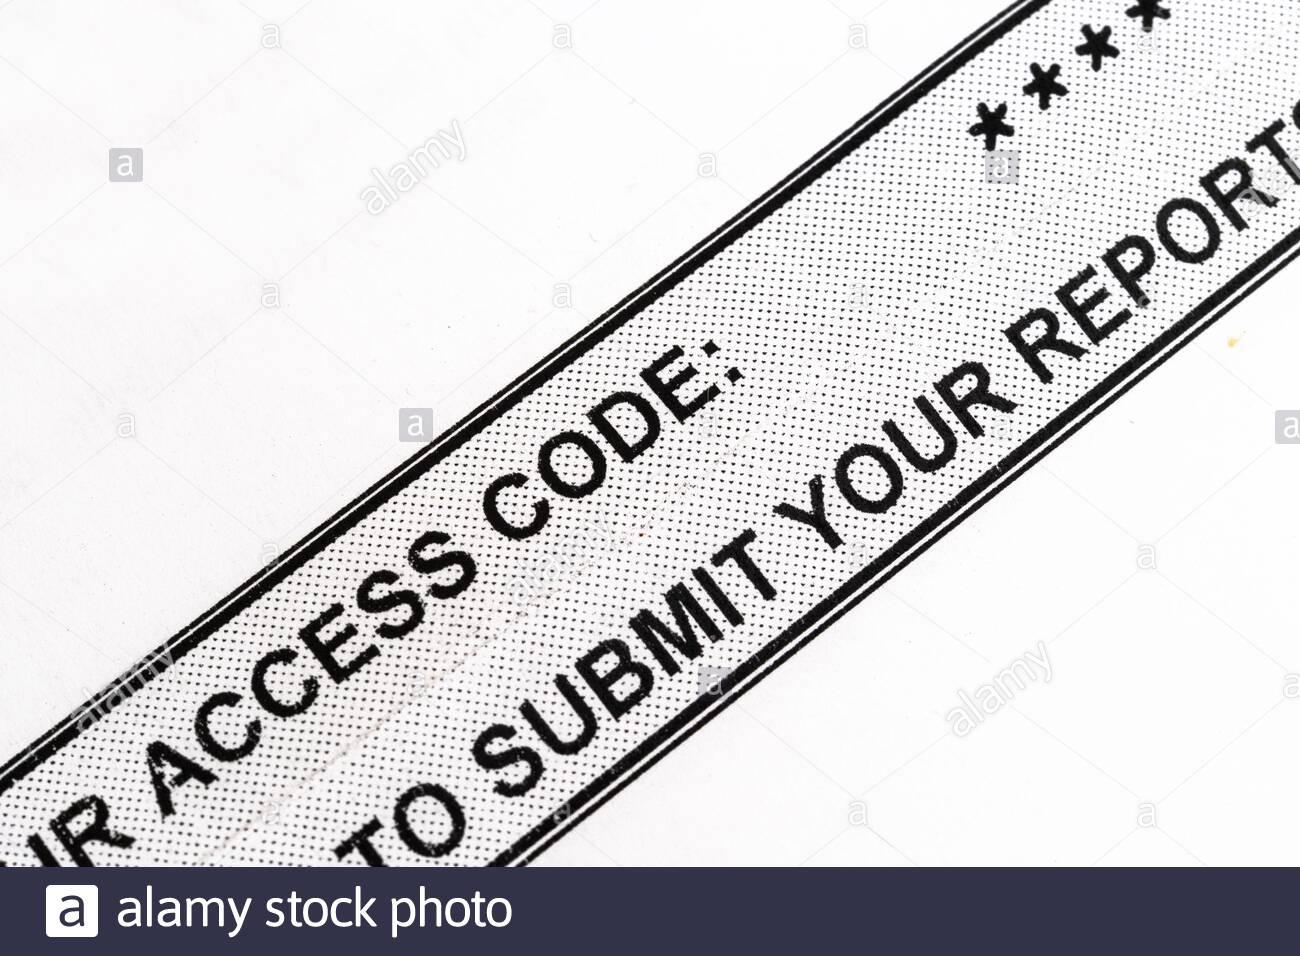 Access Code To The Canada Employment Insurance Amid The Coronavirus Or Covid 19 Stock Photo Alamy